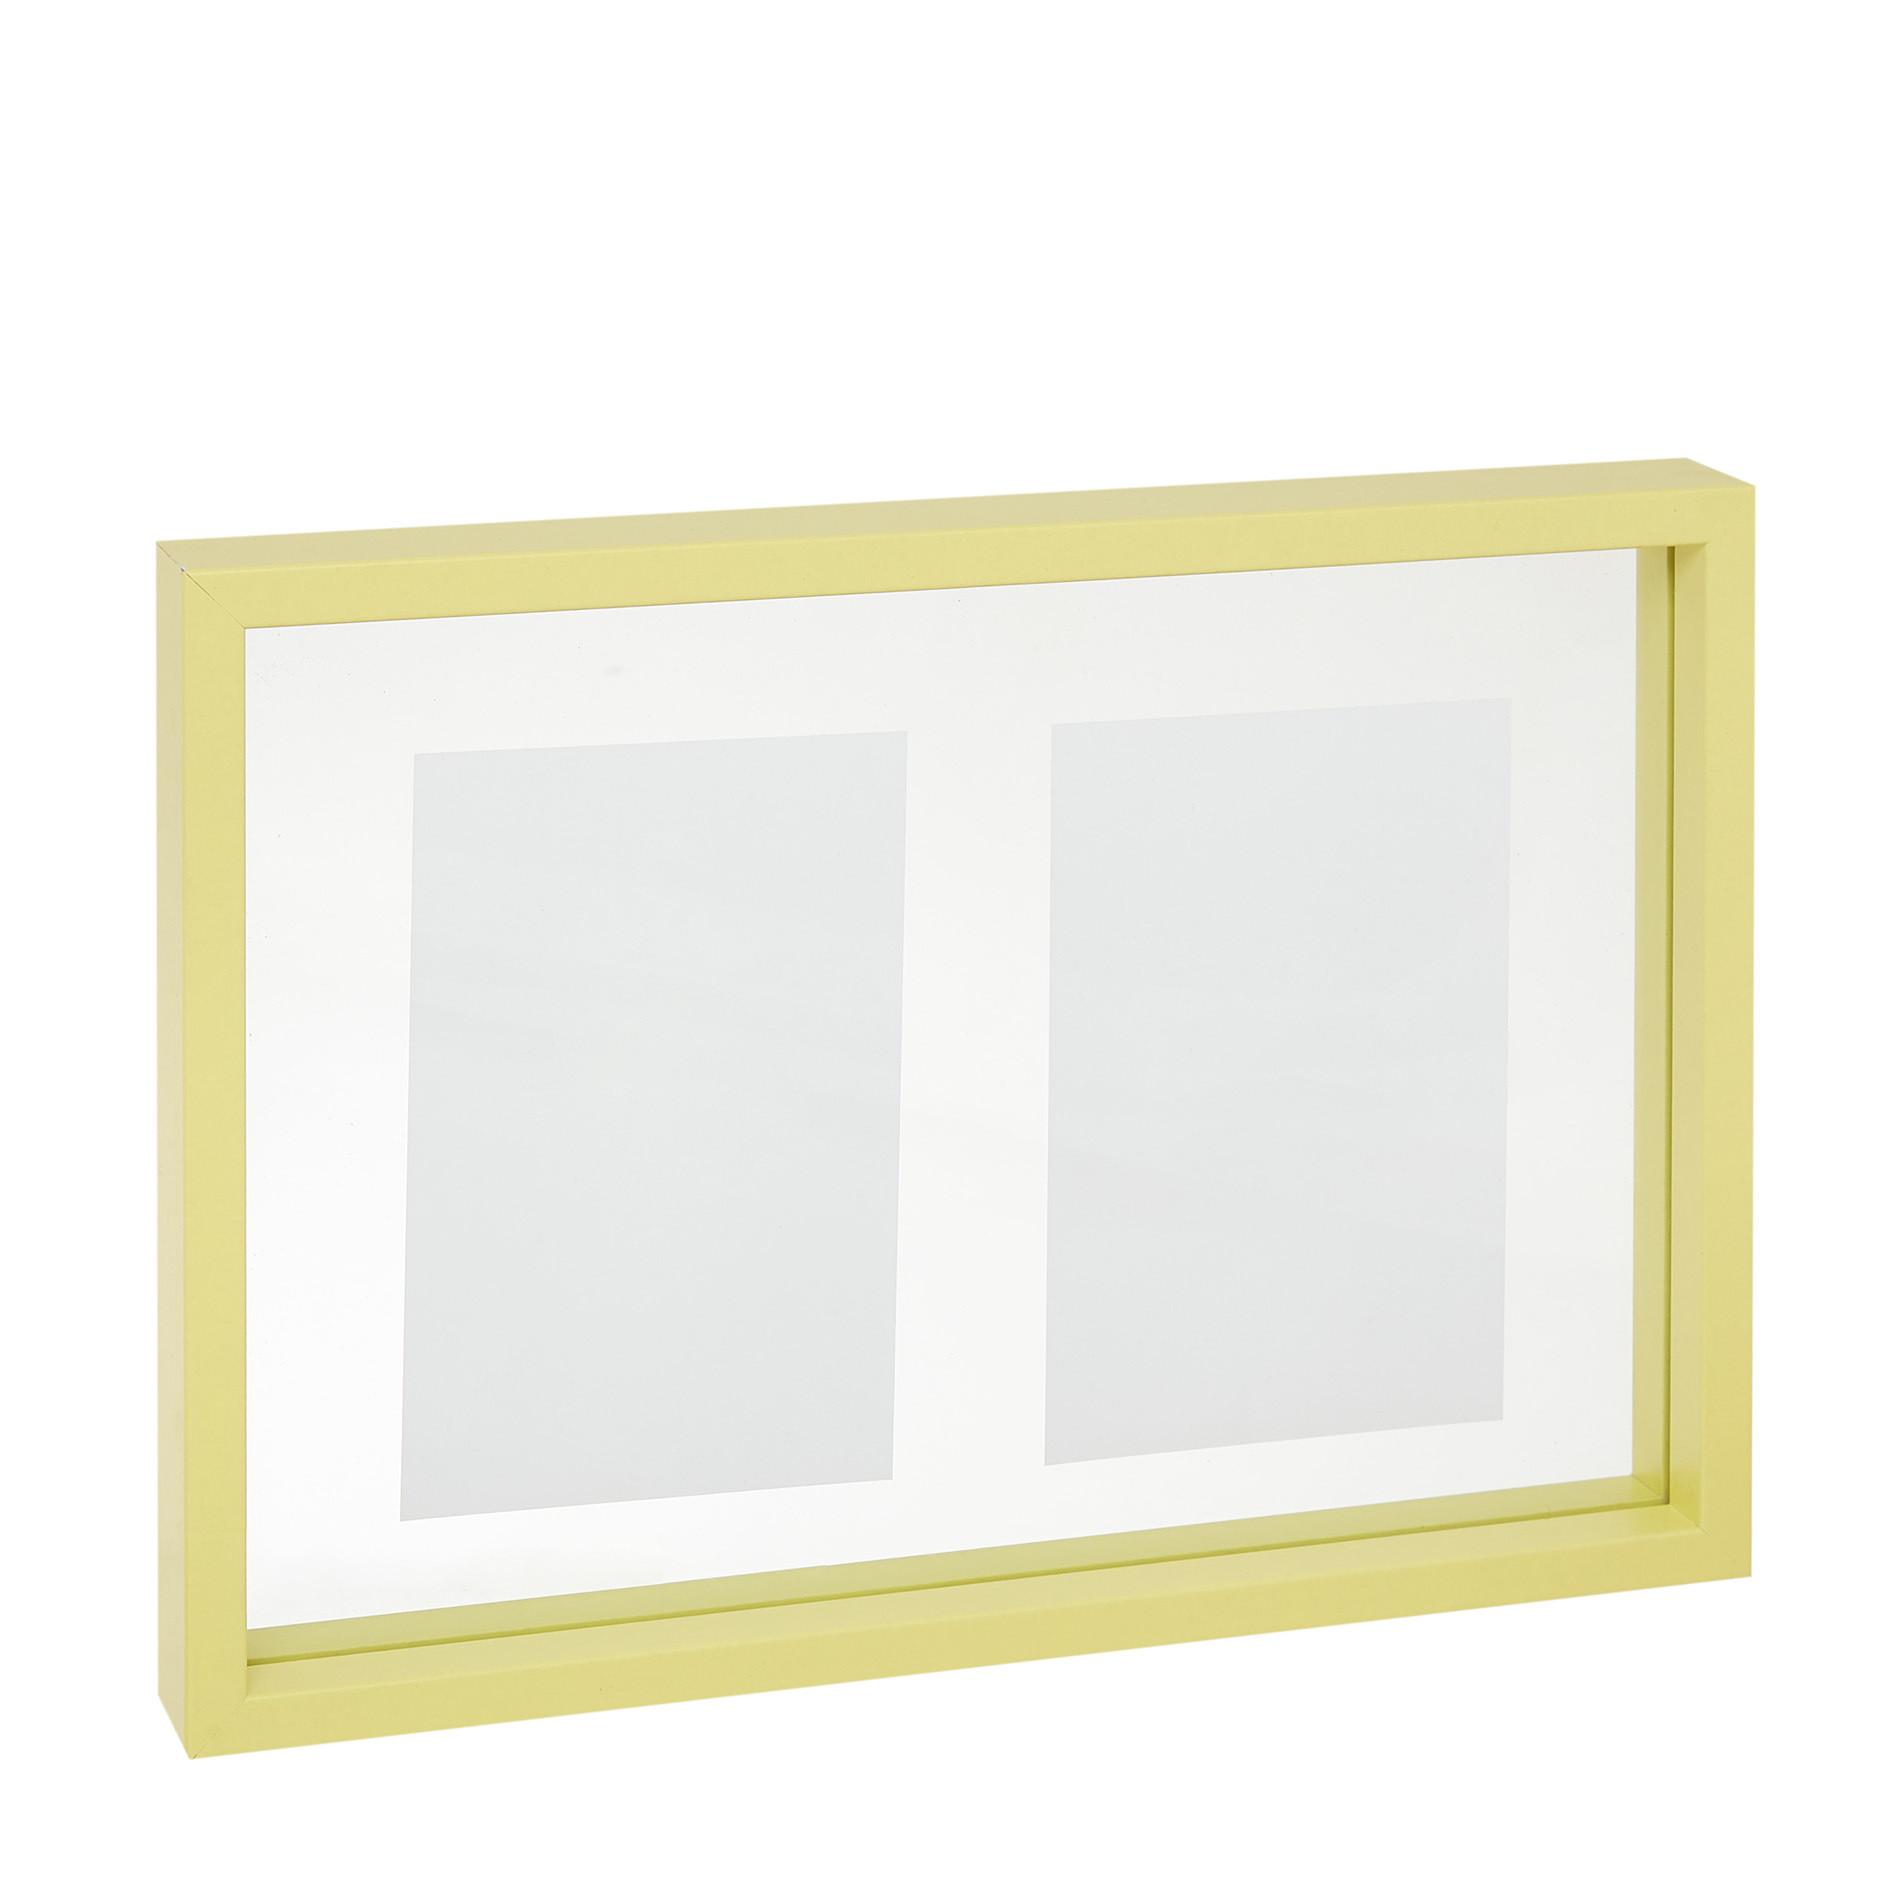 Portafoto cornice colorata, Giallo, large image number 0